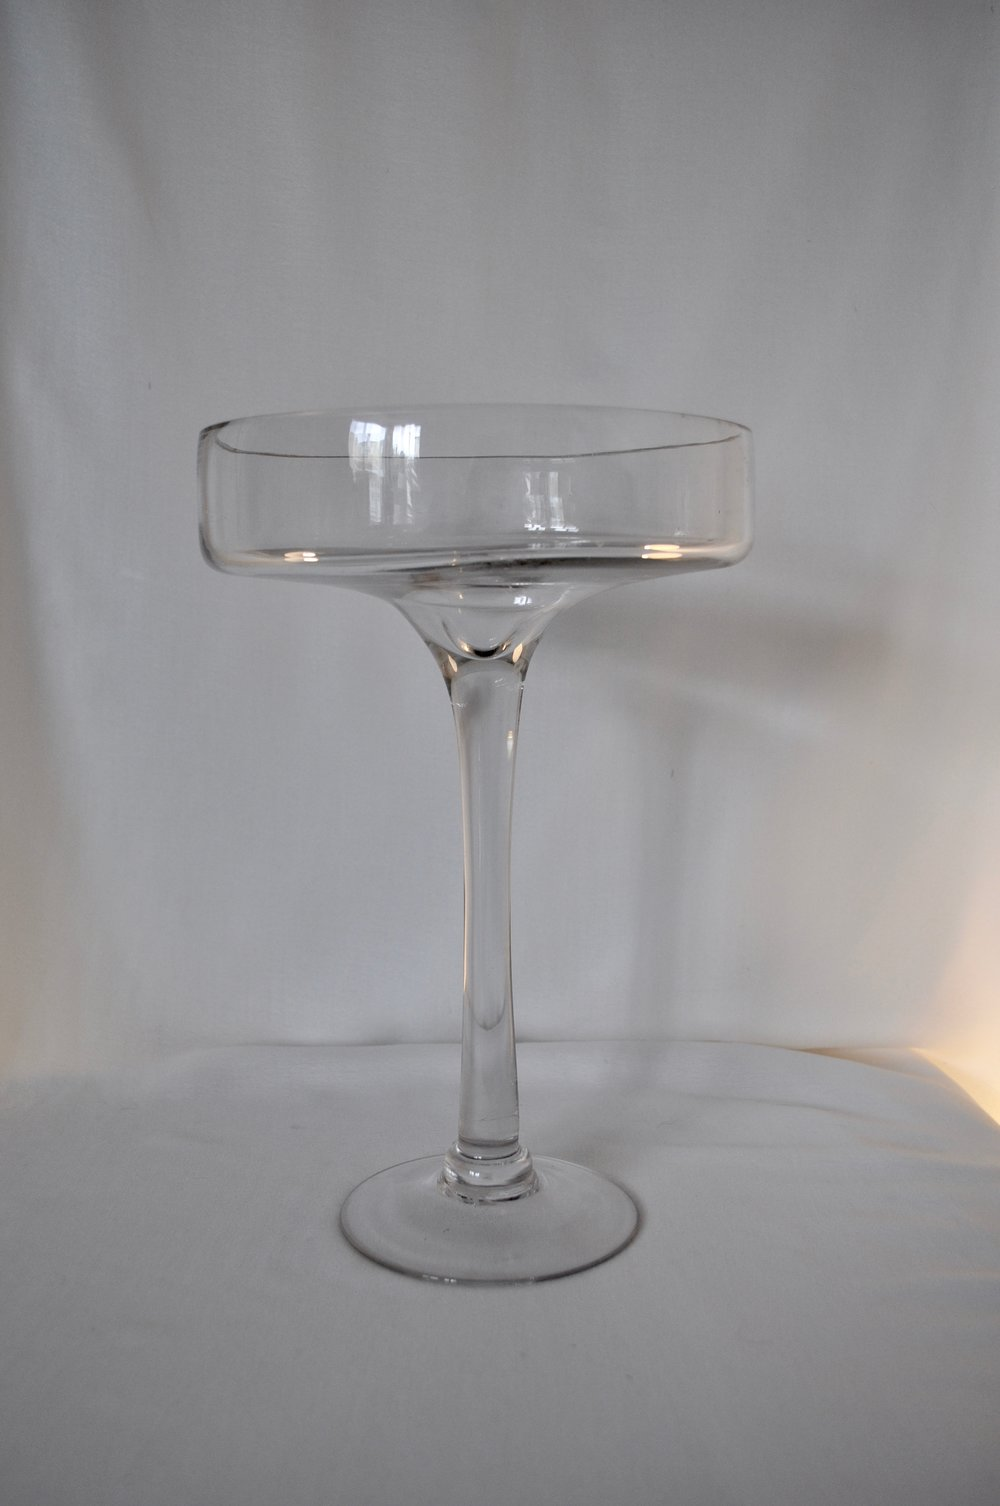 "Glass Candy Jar 6x14"" - Qty: 2"